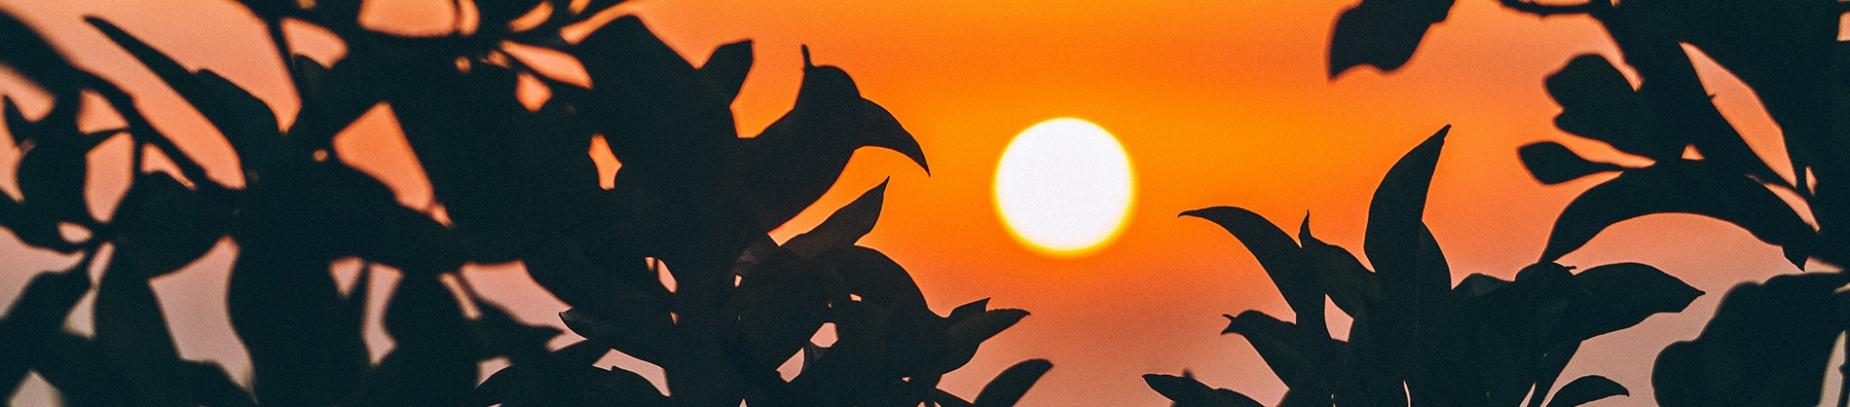 Sun shining through the trees at sunrise